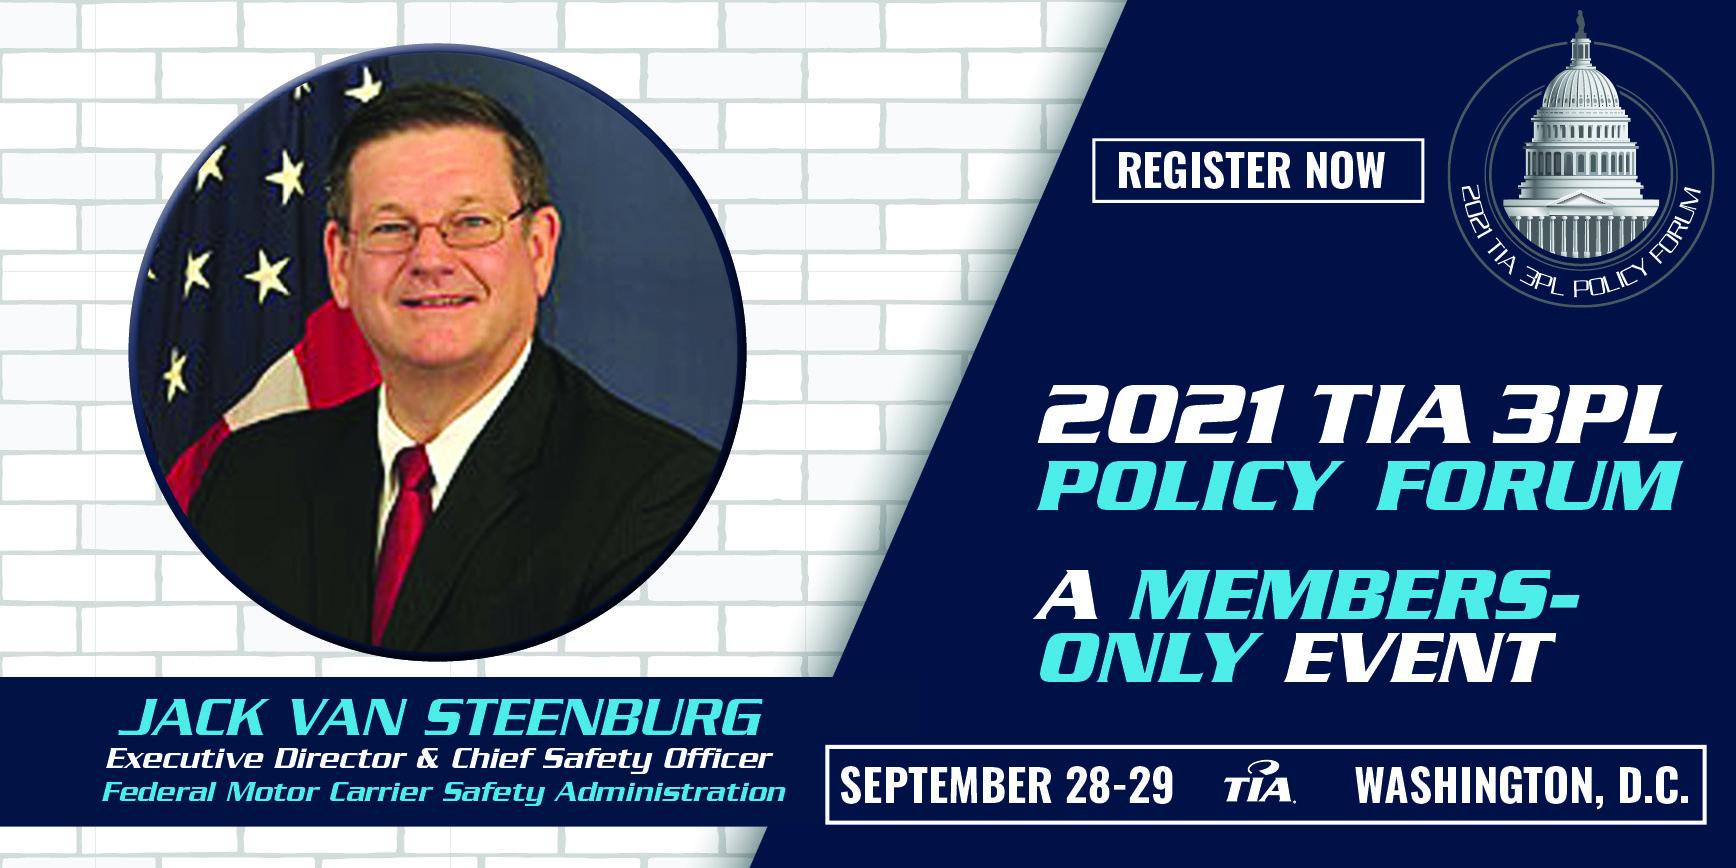 2021 Policy Forum Social (Van Steenburg)